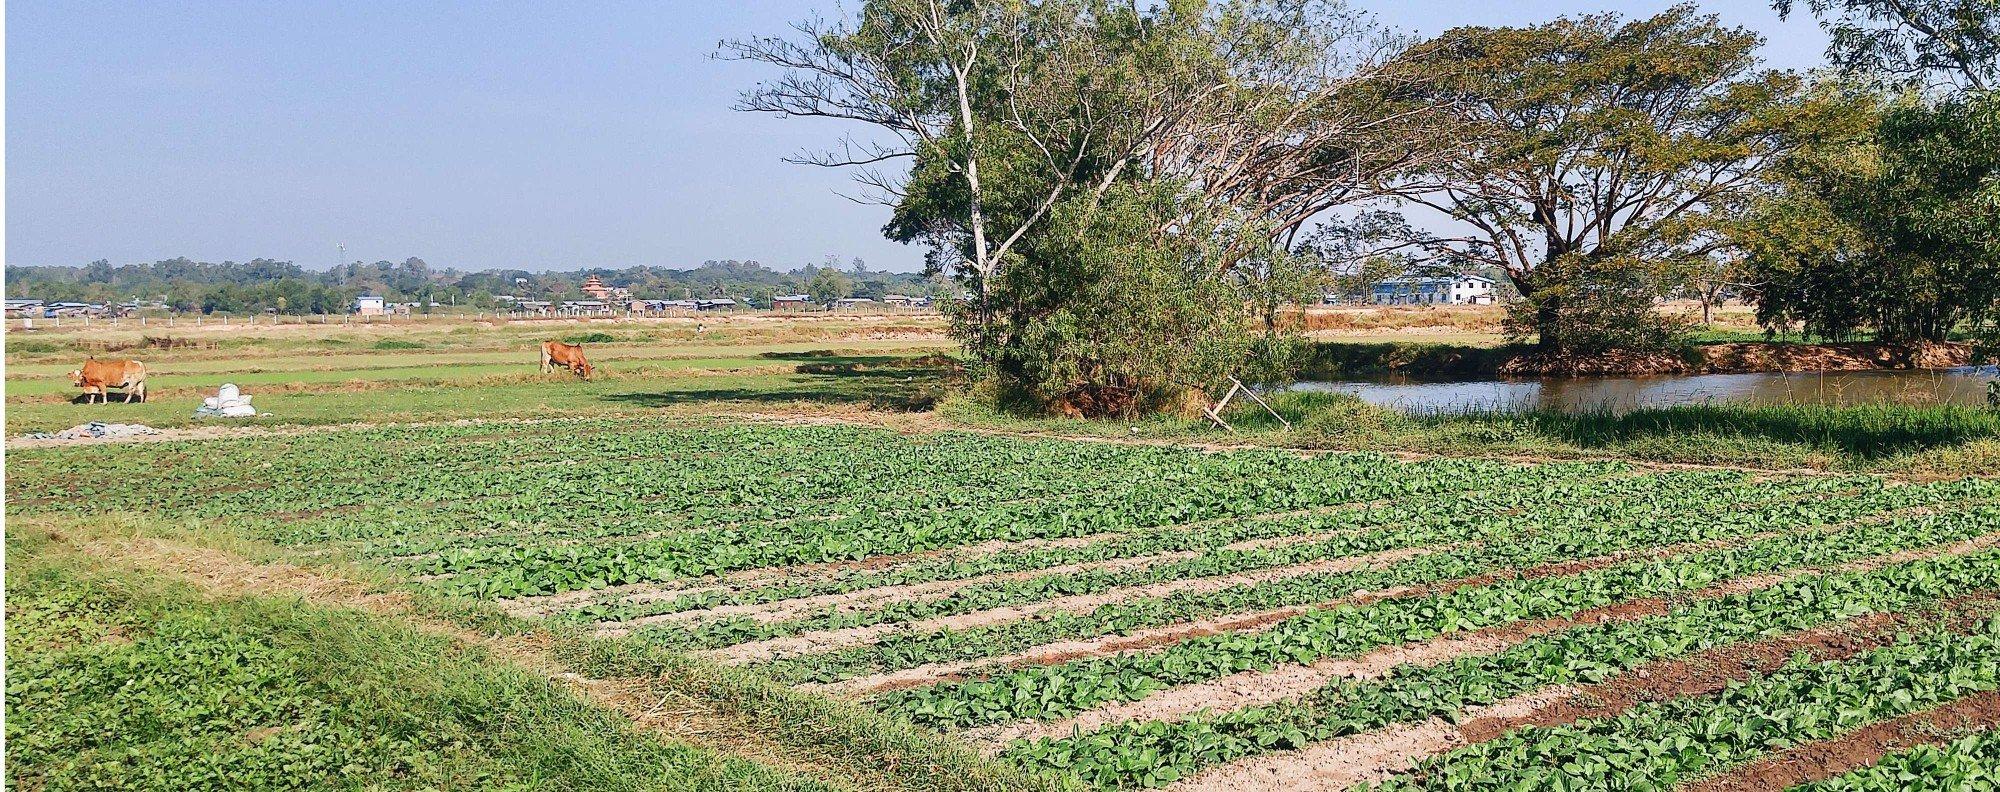 A Paw San rice field in Myanmar. Photo; Karim Raslan.